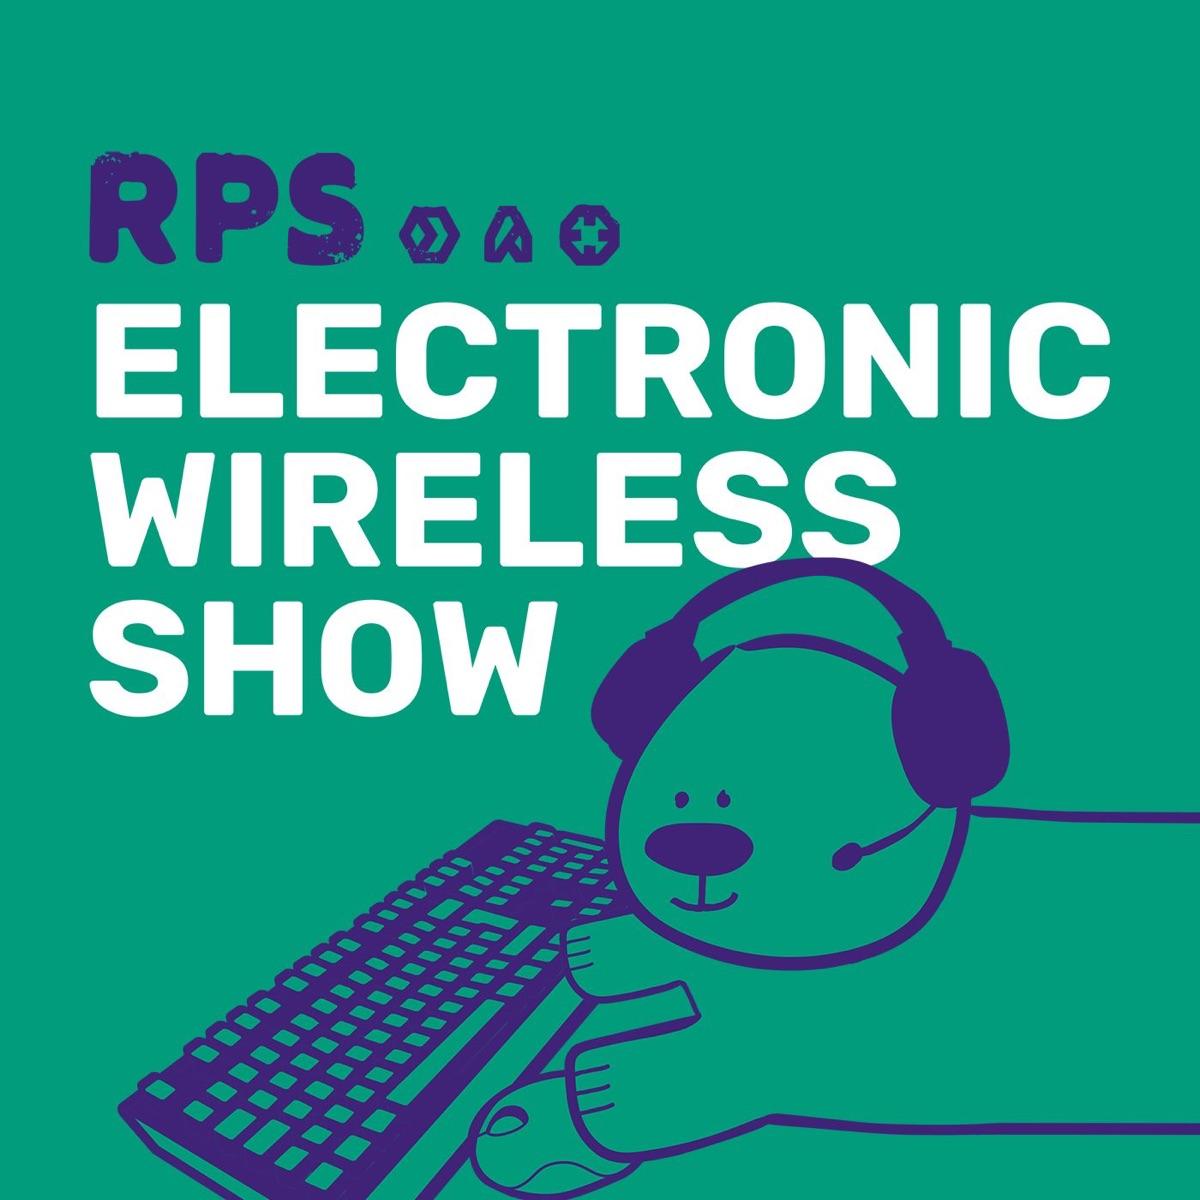 Electronic Wireless Show